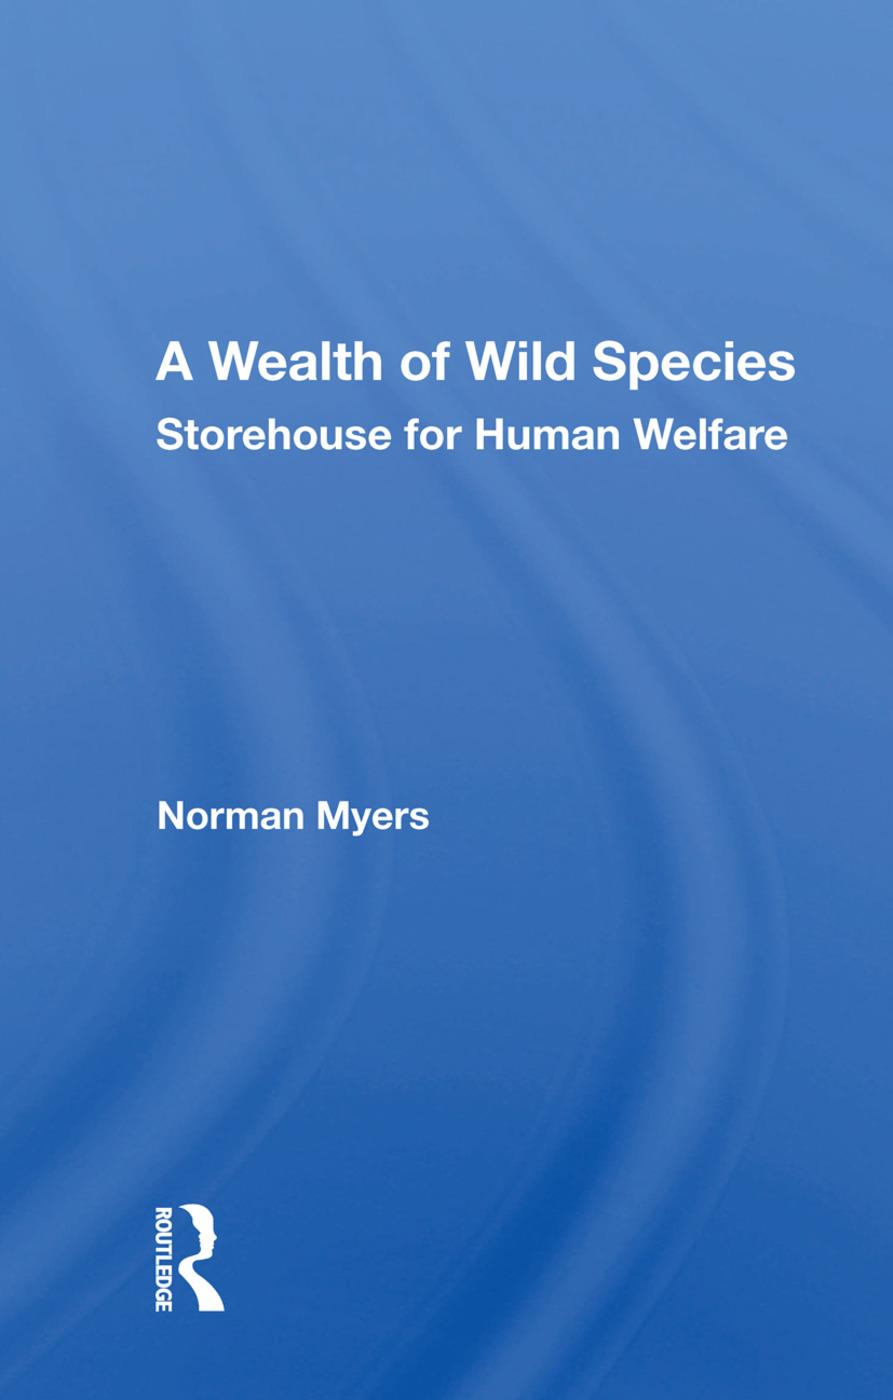 A Wealth of Wild Species